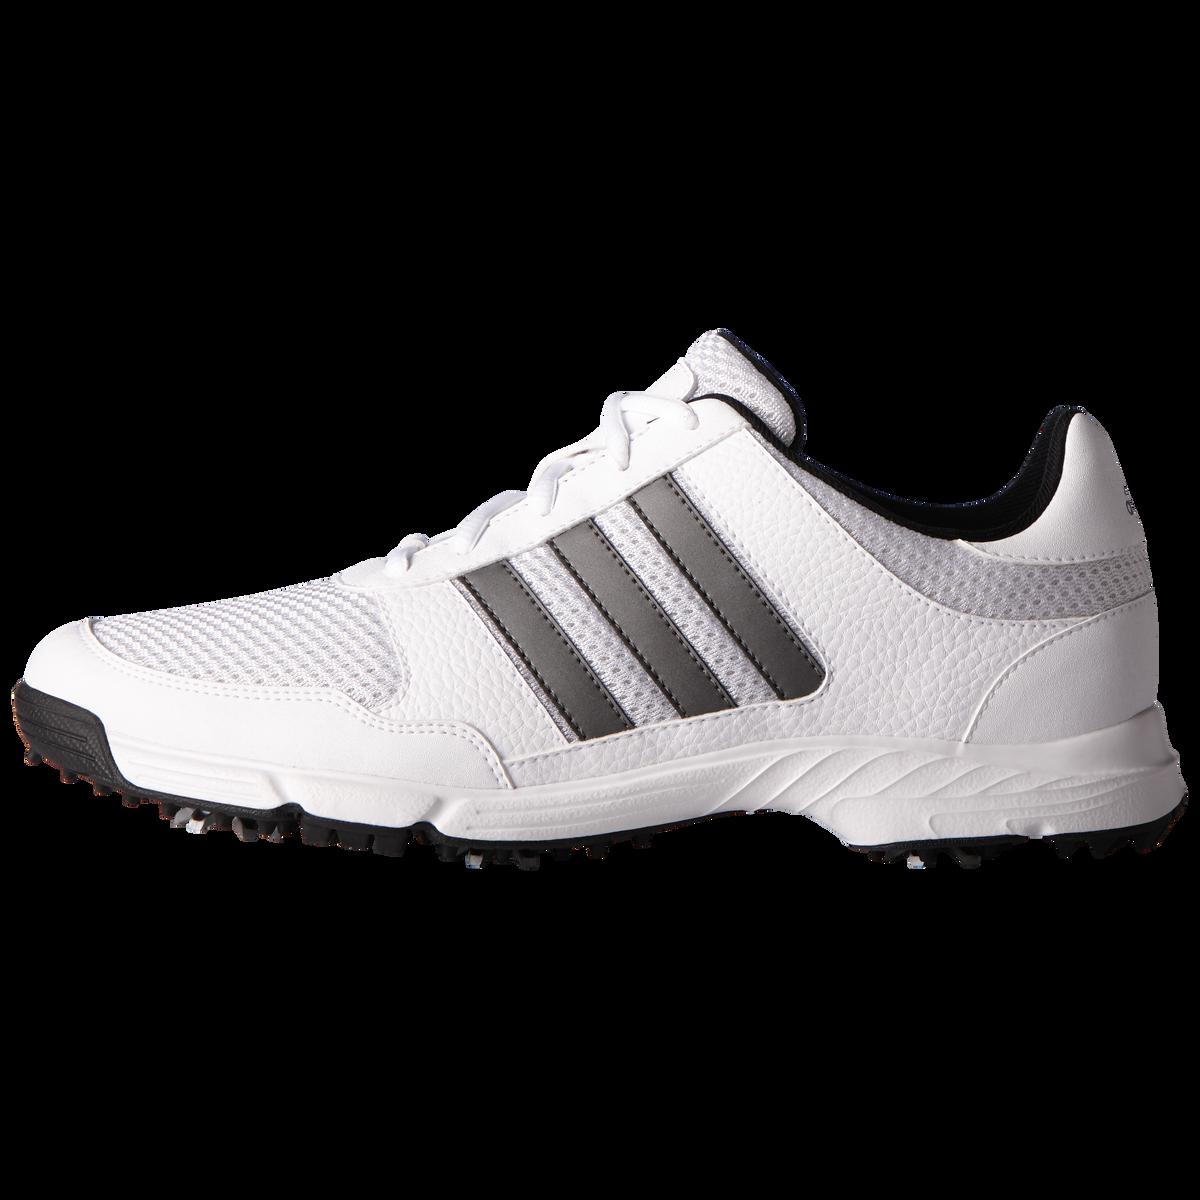 aa0413c90820d7 adidas Tech Response Men's Golf Shoe - White/Silver Zoom Image